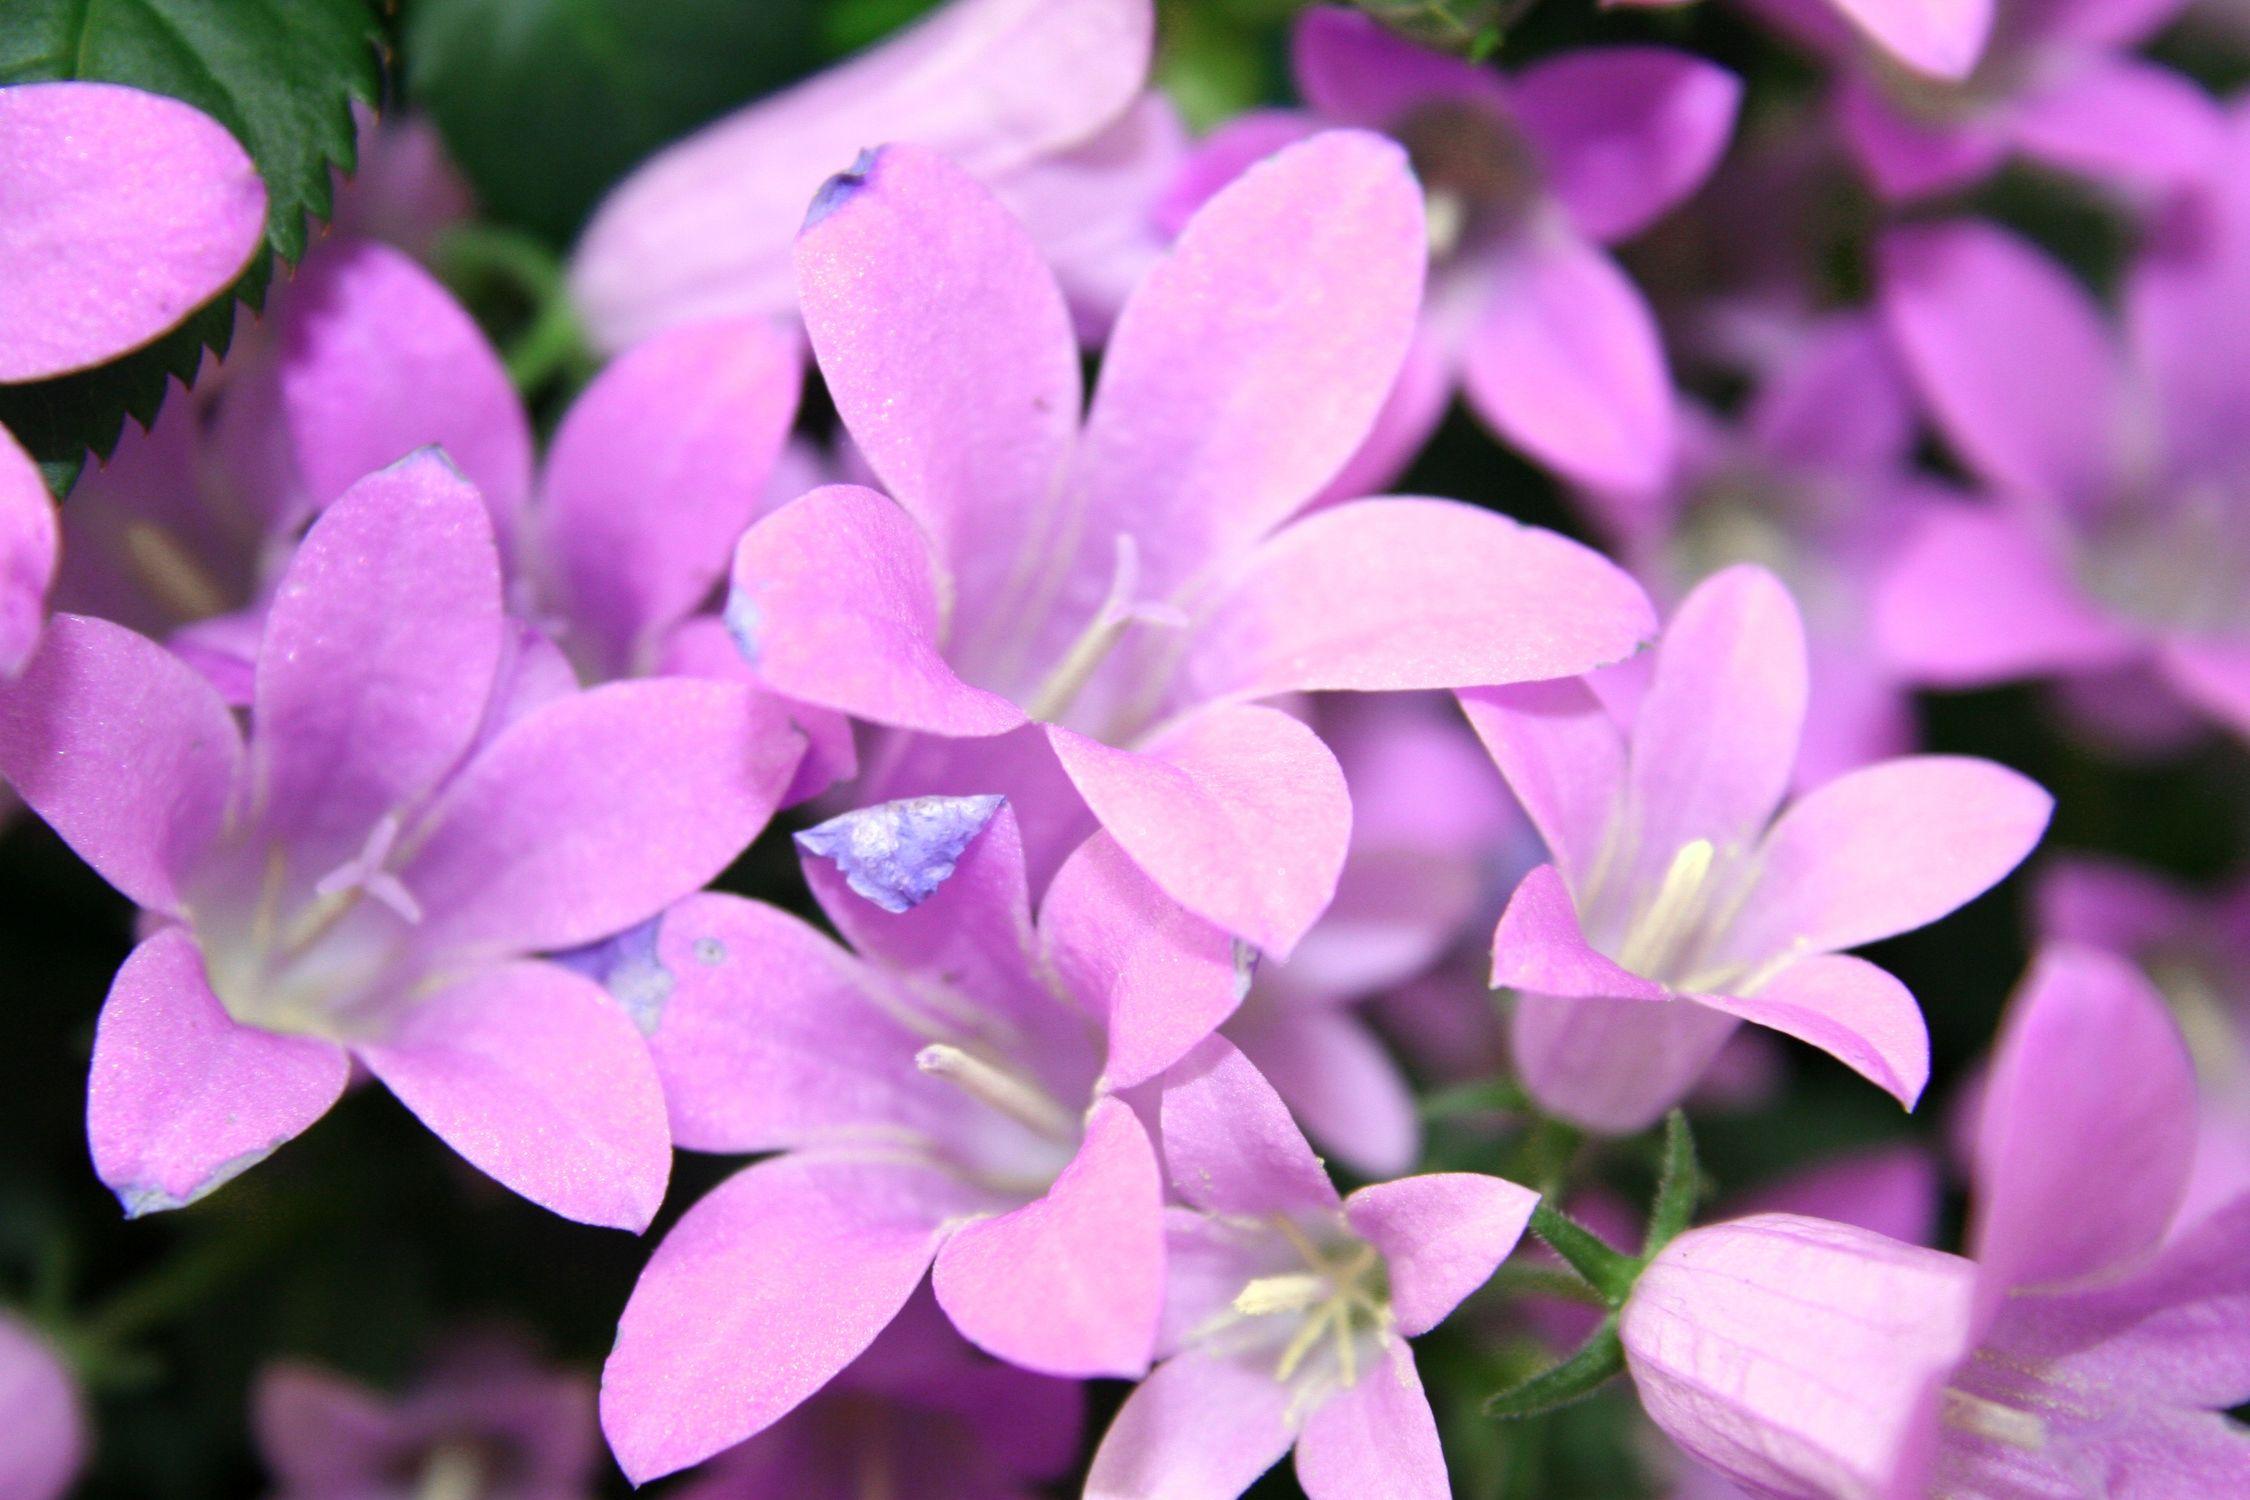 Bild mit Farben, Natur, Pflanzen, Blumen, Rosa, Lila, Violett, Glockenblumen, Magenta, männertreu